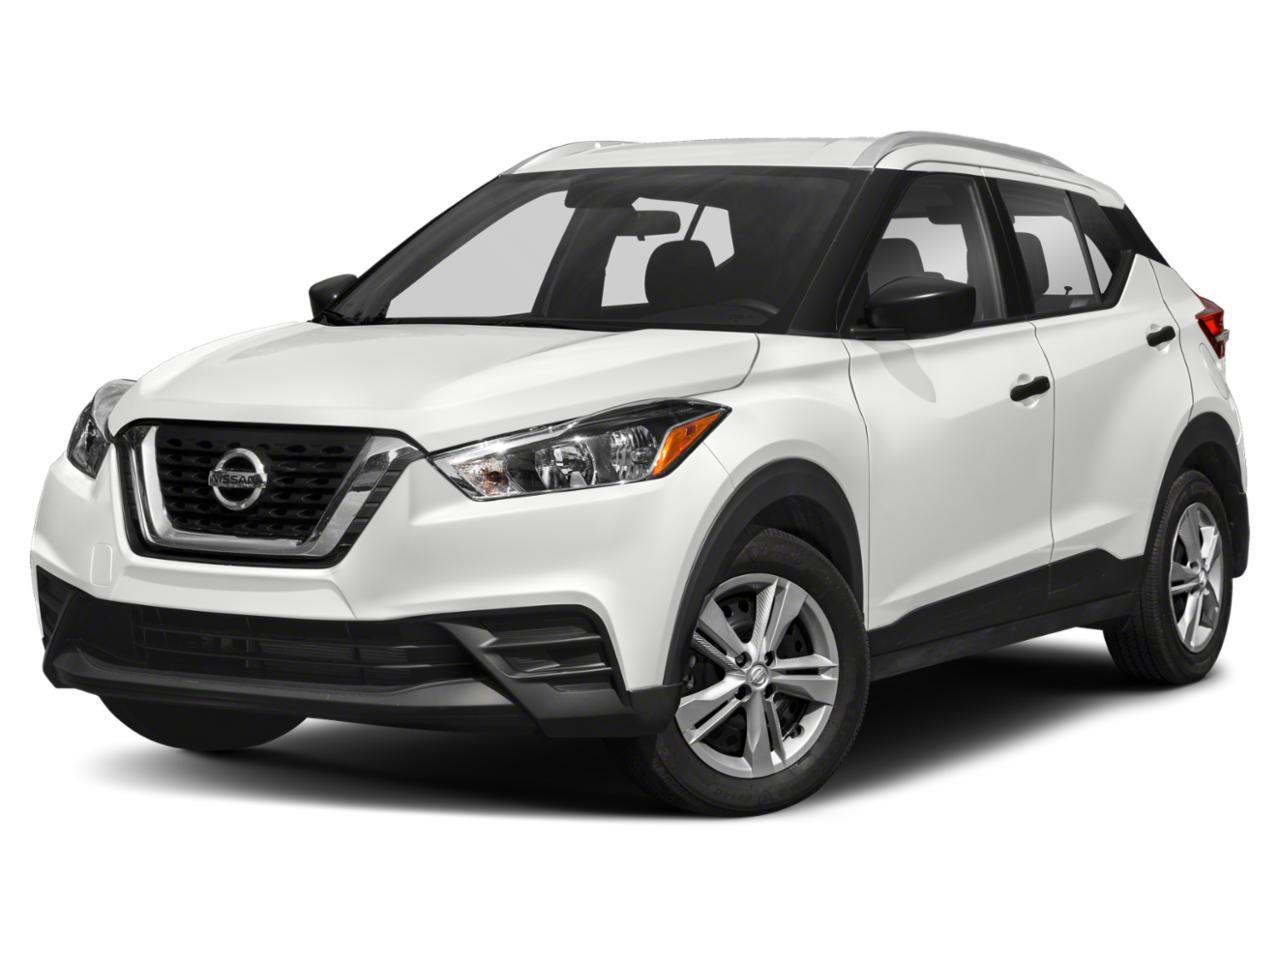 2019 Nissan Kicks Vehicle Photo in MEDINA, OH 44256-9631